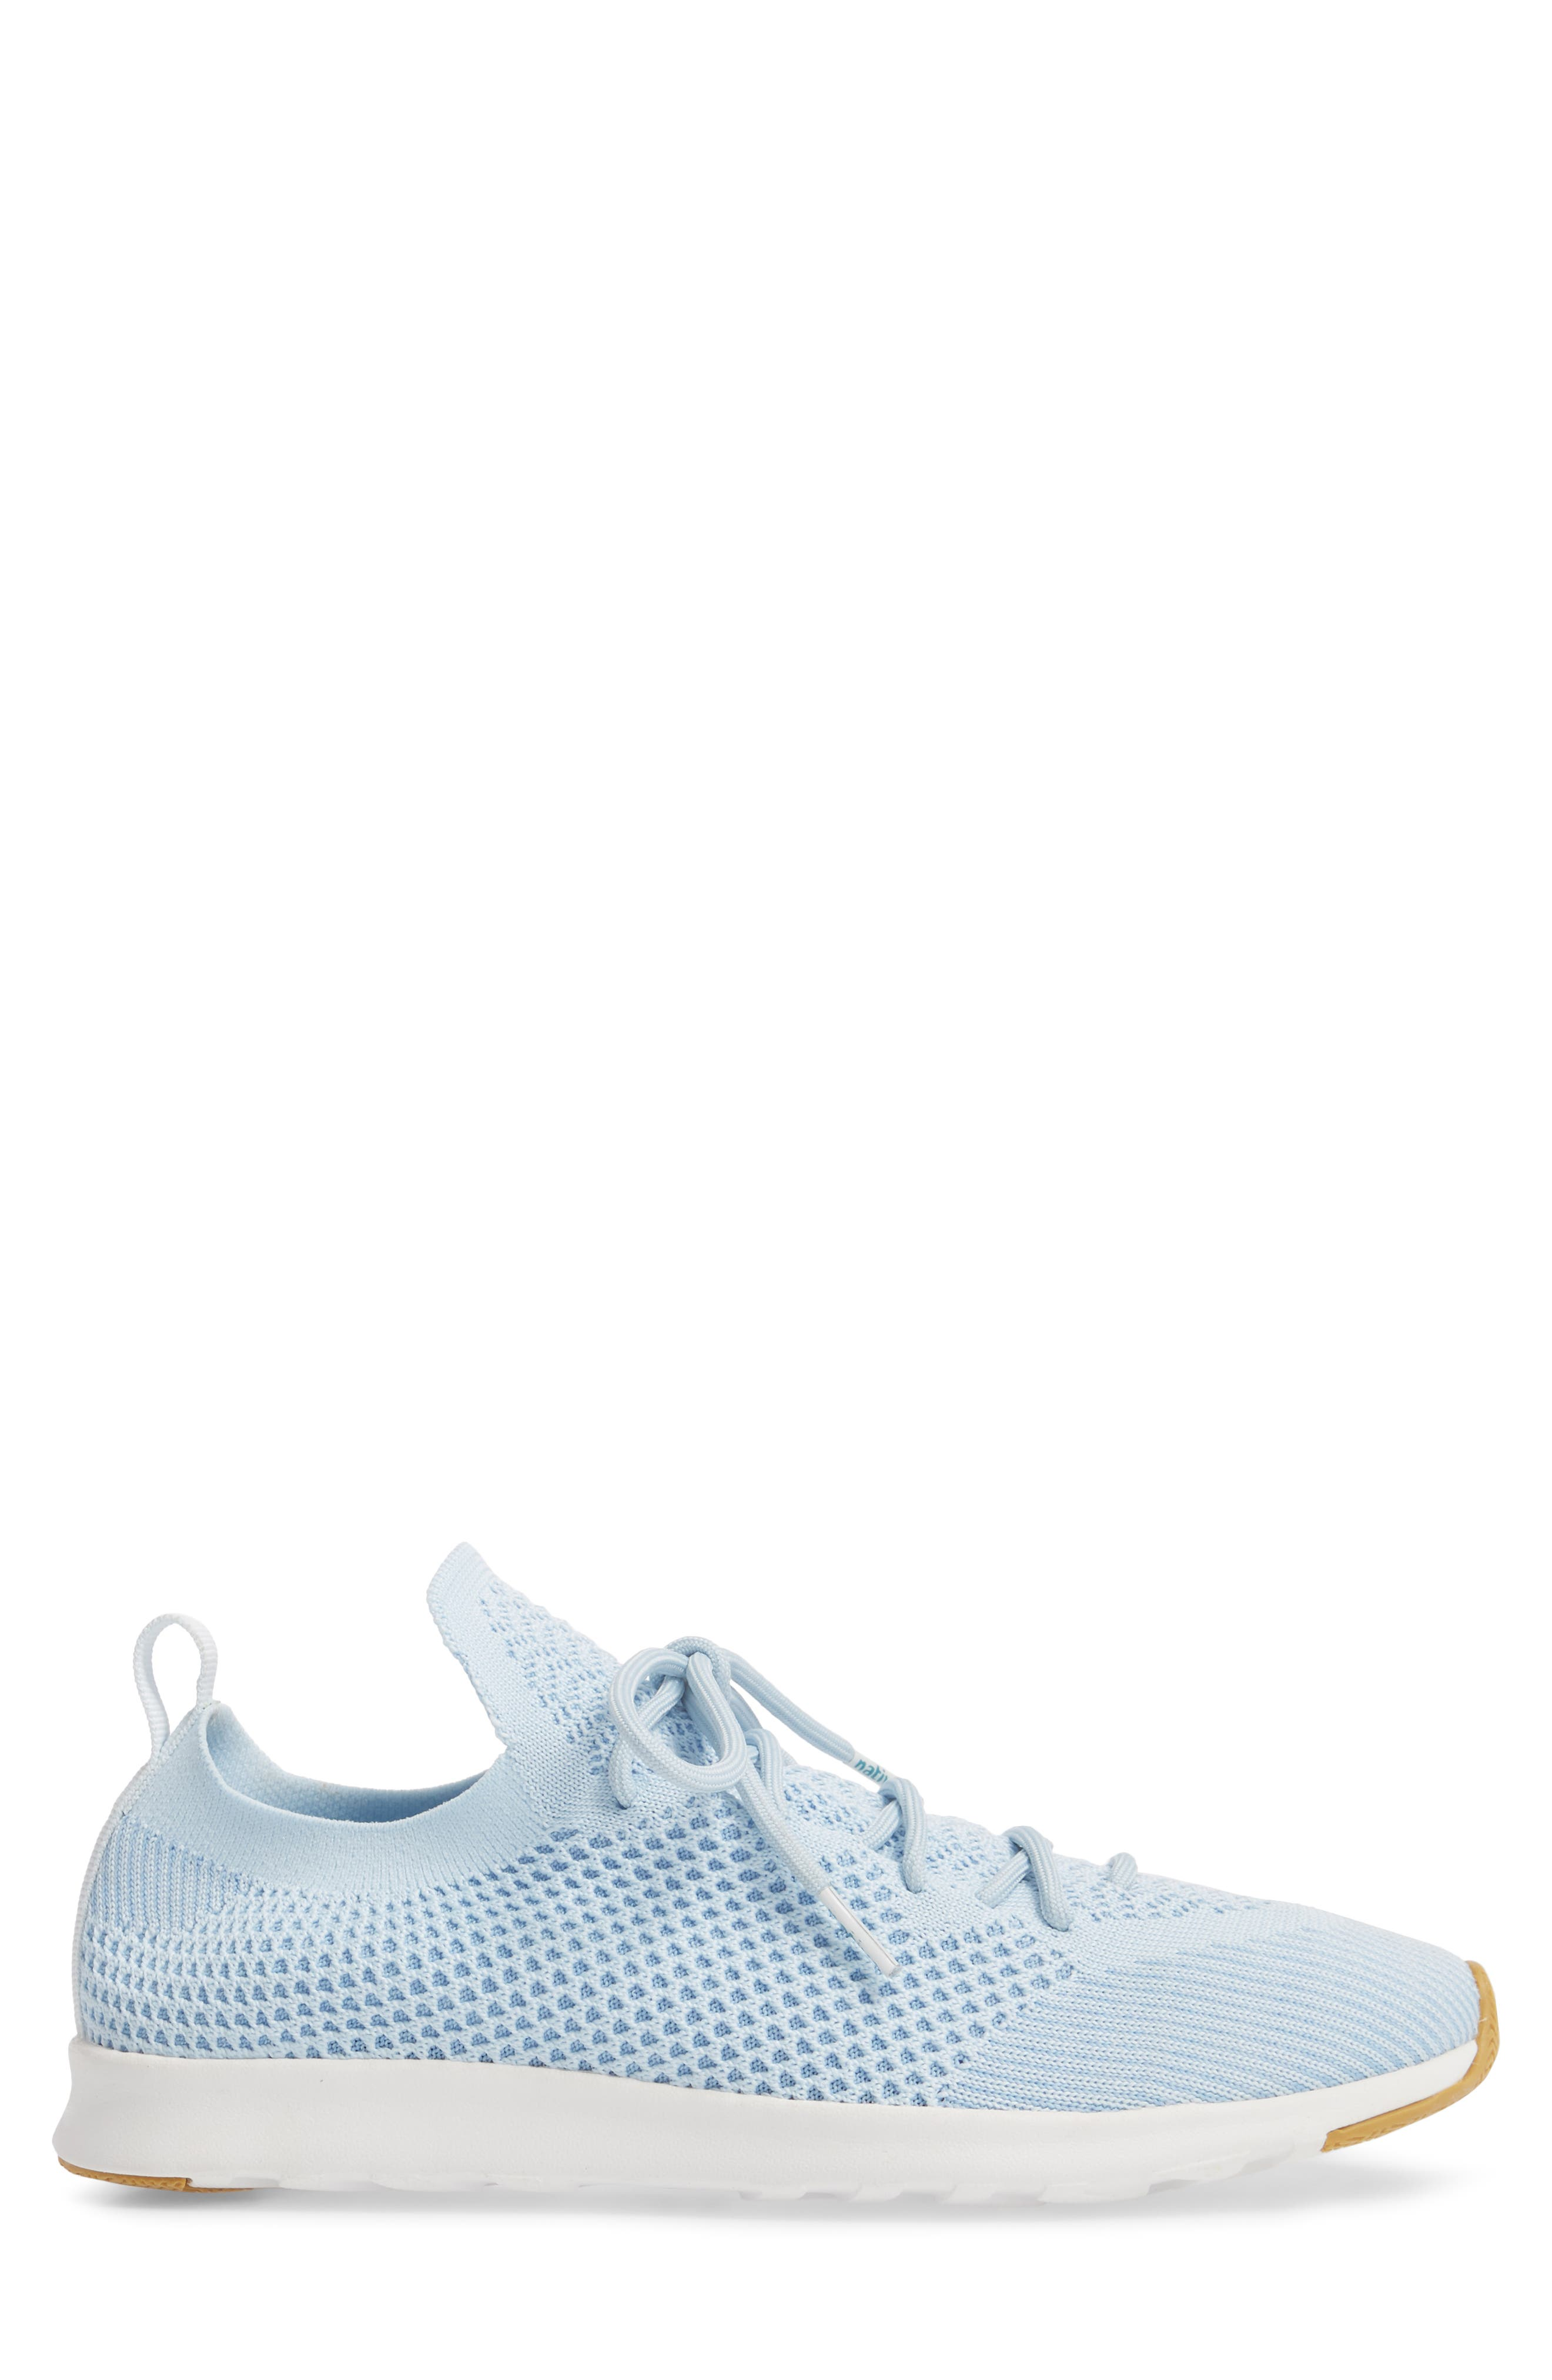 AP Mercury Liteknit<sup>™</sup> Sneaker,                             Alternate thumbnail 3, color,                             AIR BLUE/ SHELL WHITE